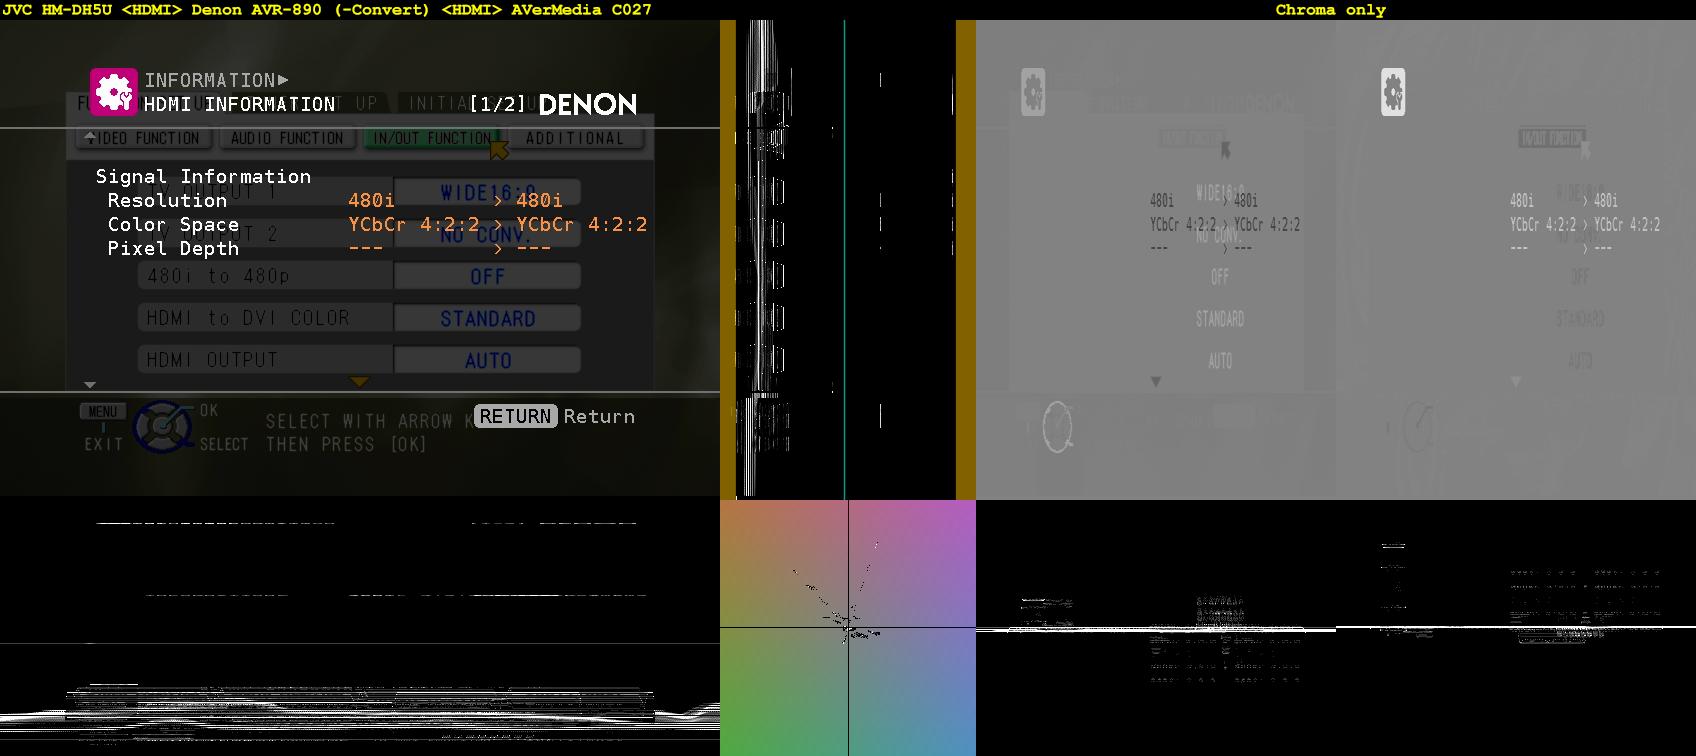 Click image for larger version  Name:Menu + Info - JVC HM-DH5U =HDMI= Denon AVR-890, -Convert =HDMI= AVerMedia C027.png Views:3286 Size:270.9 KB ID:35267